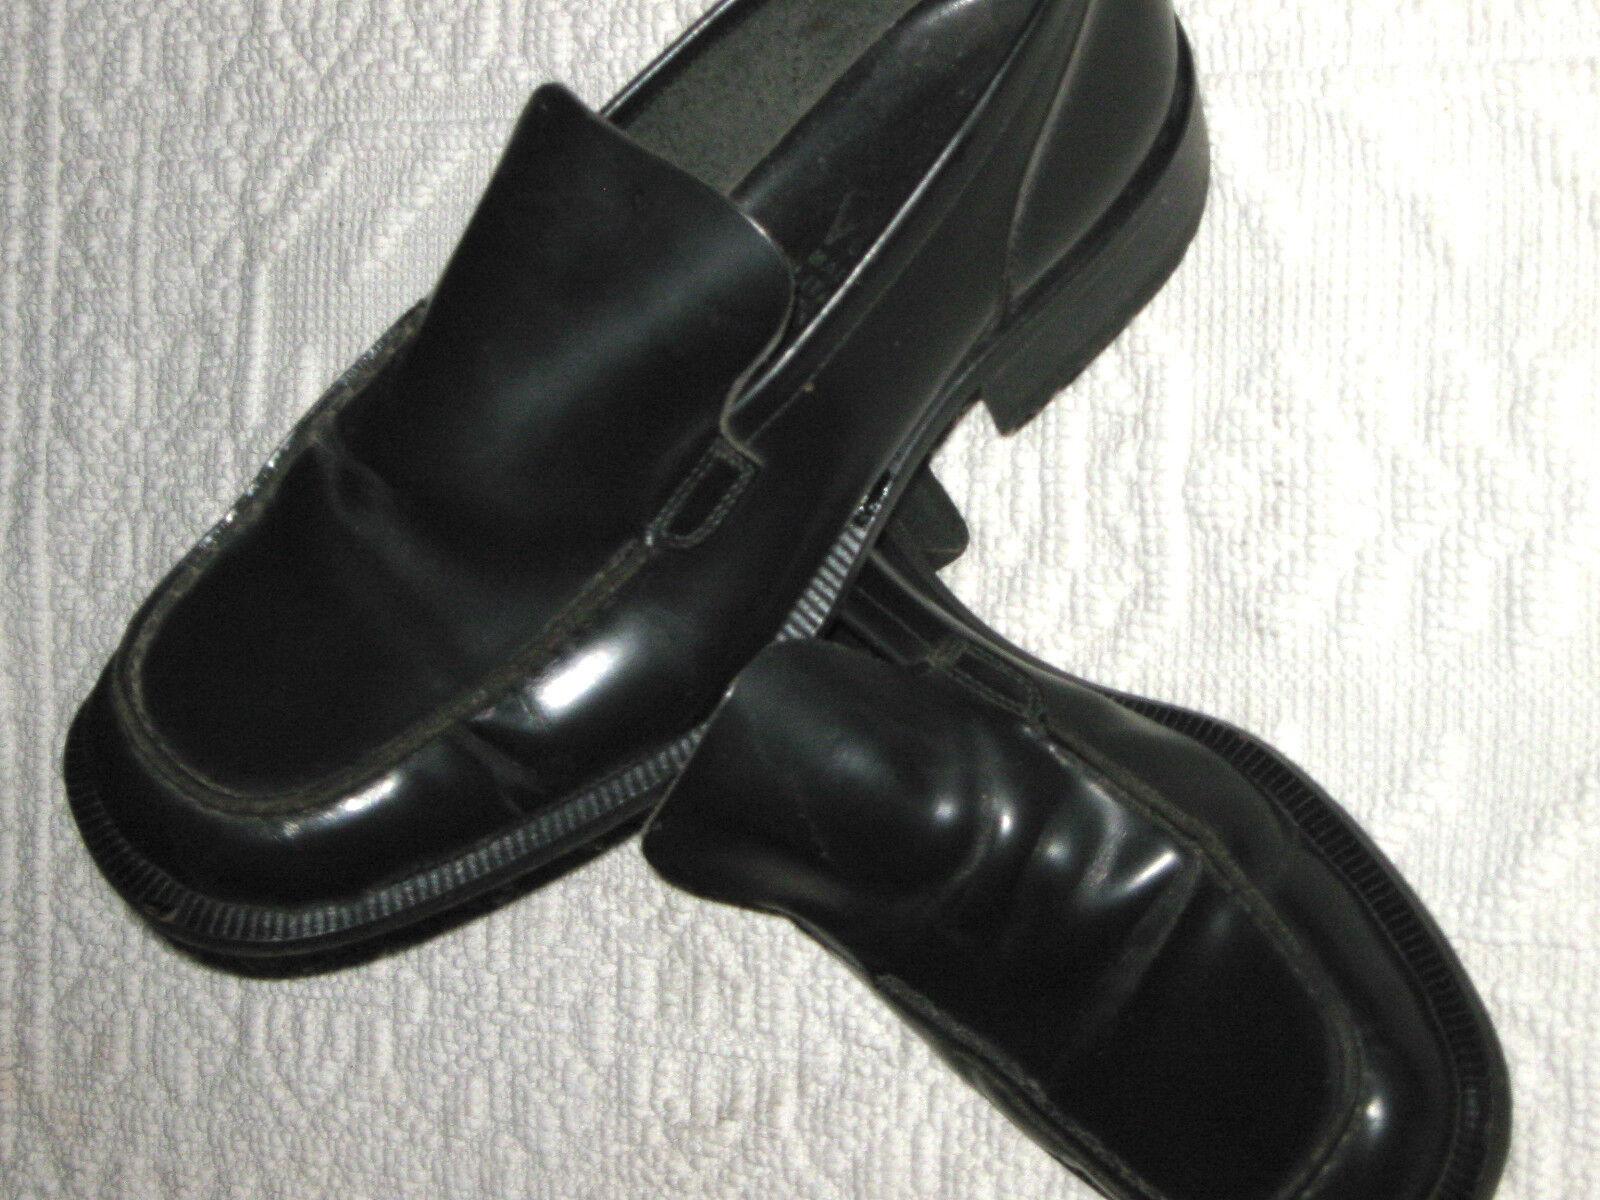 Mocassini herren In Vero Cuoio Spazzolato schwarz Lucido Tg.41 Made In